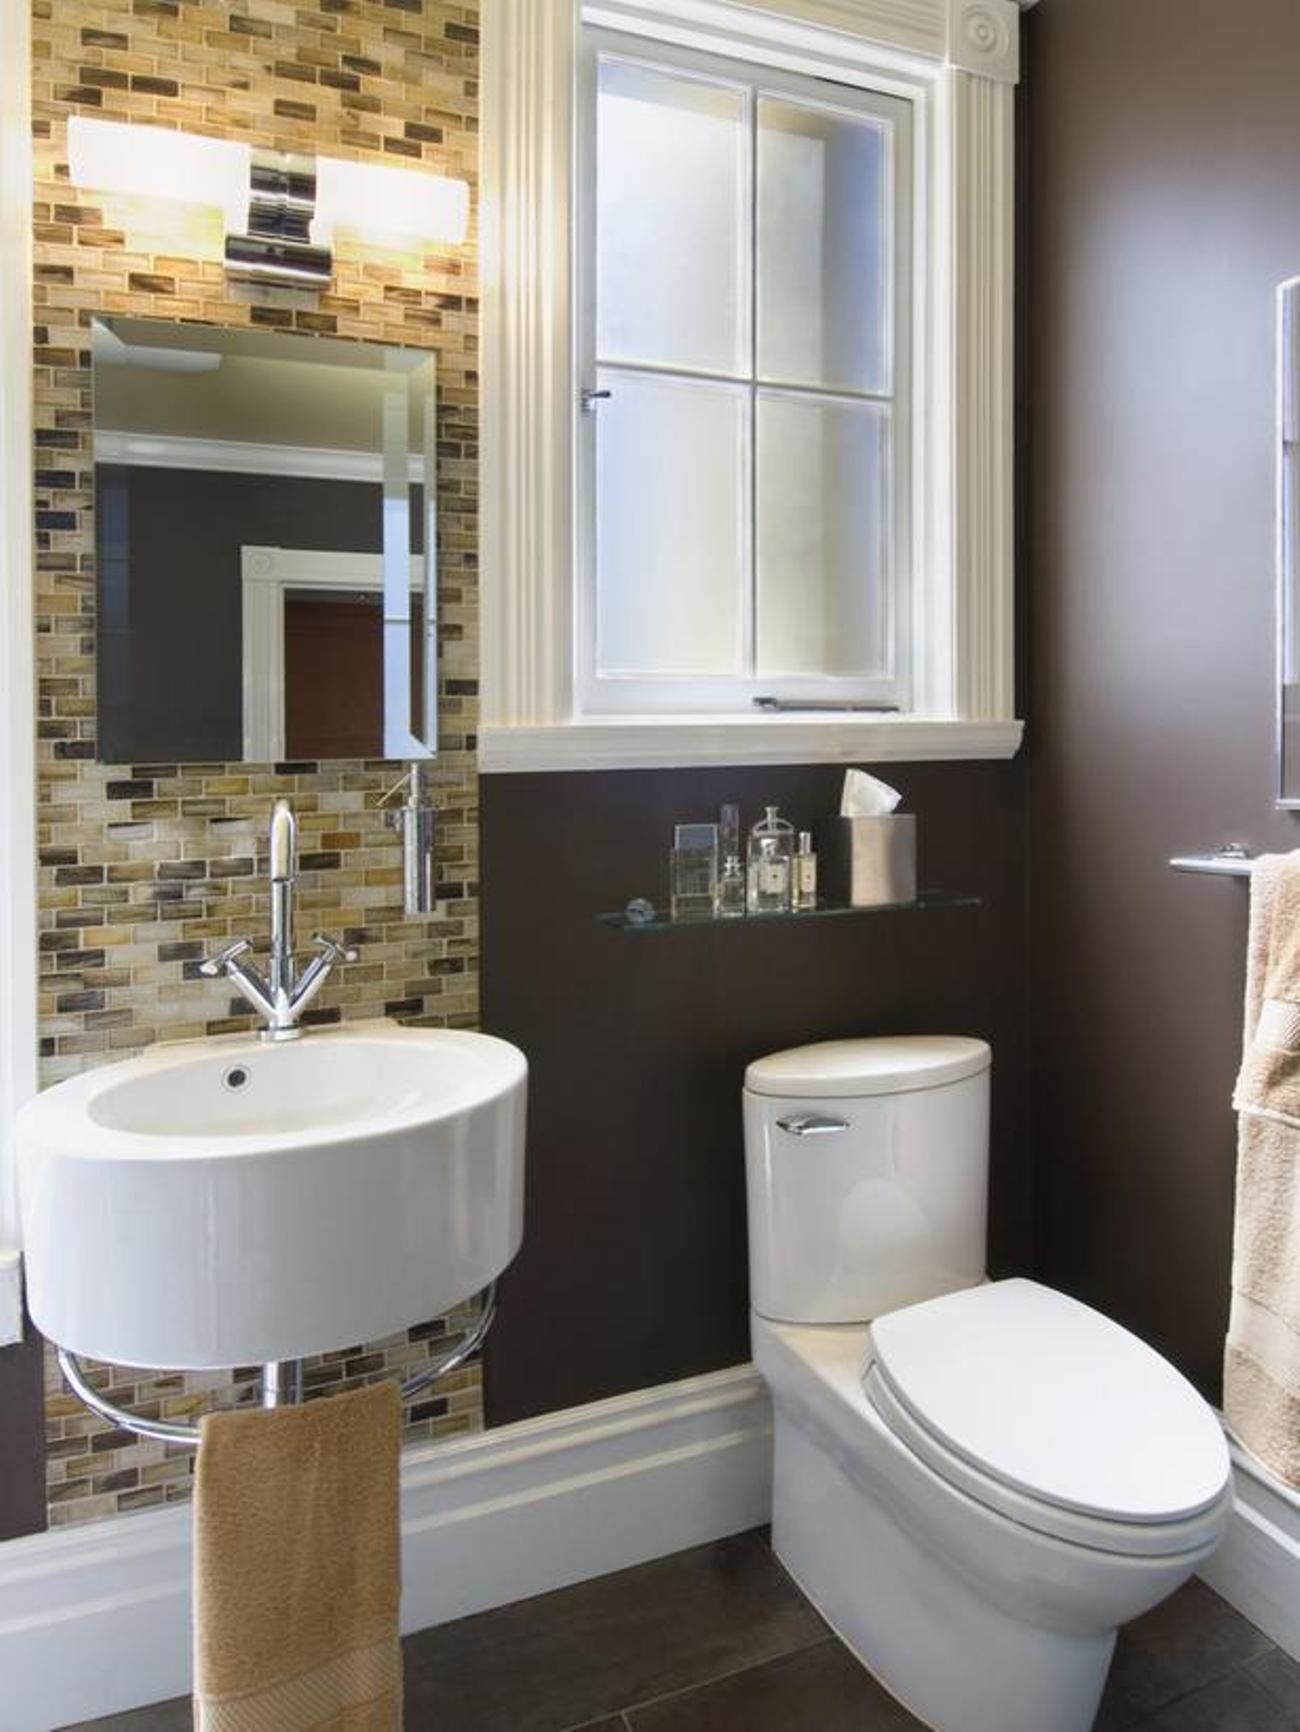 Bathroom , Good Small Bathroom Design Ideas : Small Bathroom Design Ideas With Traditional Toilet And Wall Mounted Sink With Towel Bar